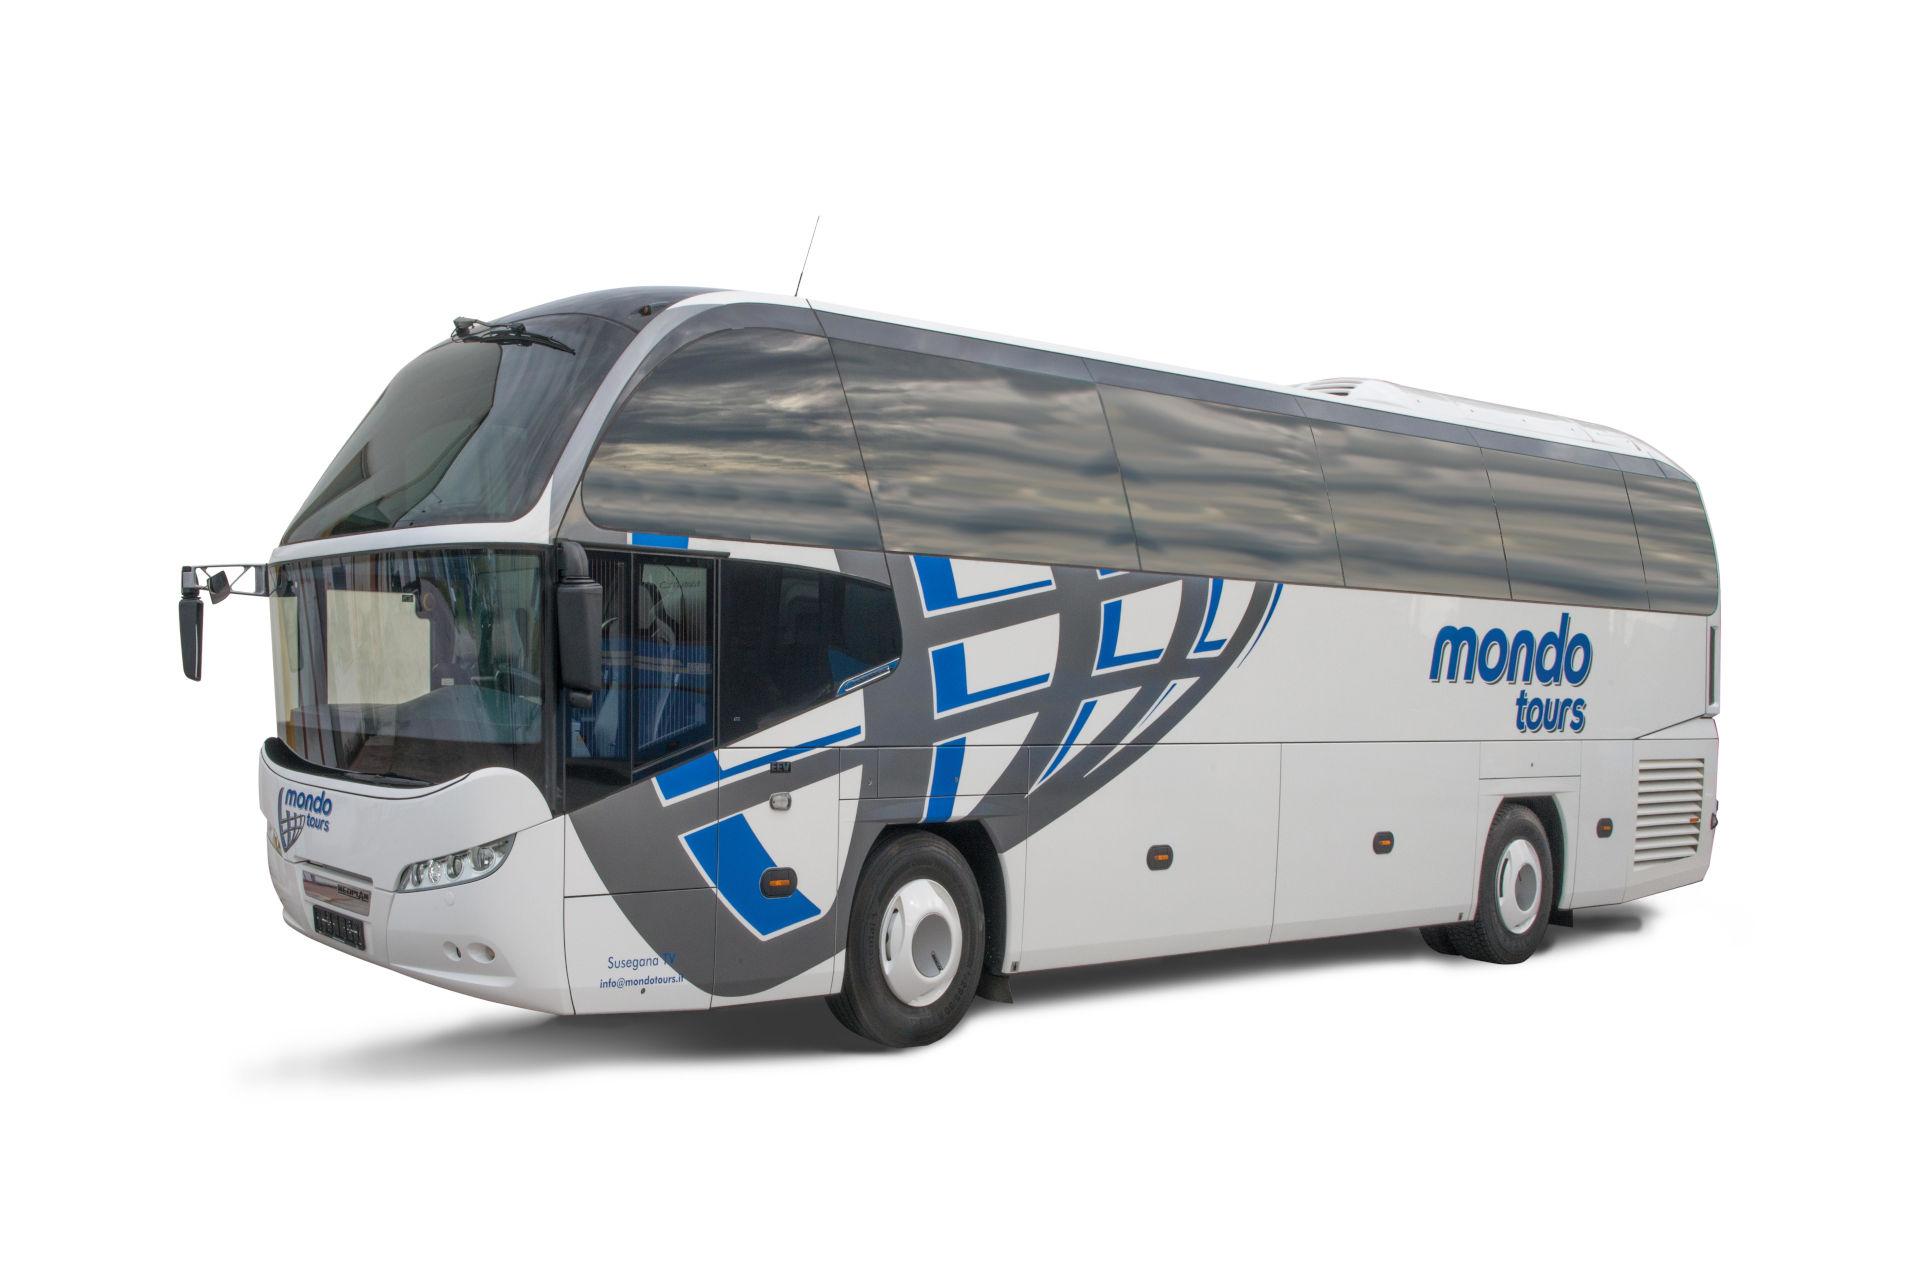 mondotours-pullman-granturismo-neoplan-cityliner-01